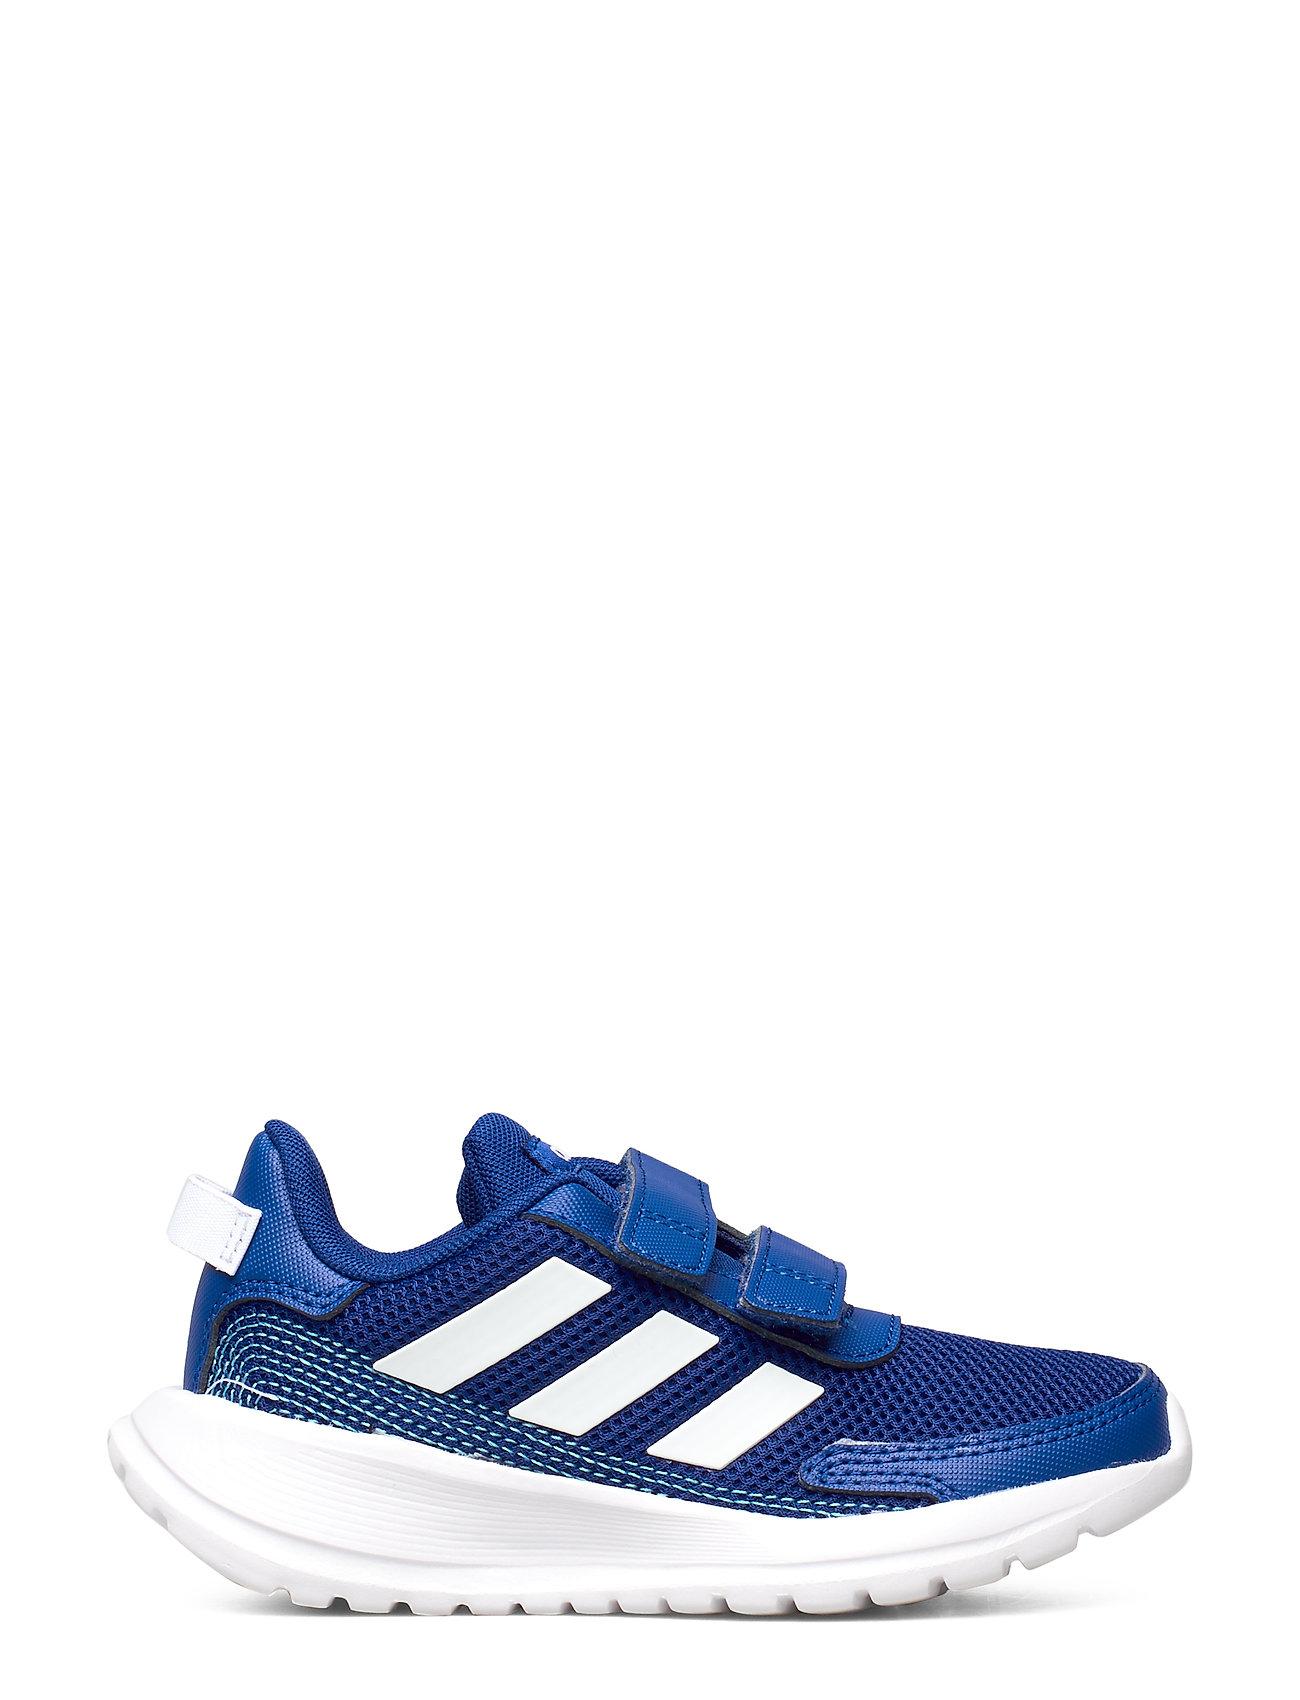 Tensaur Run C Shoes Sports Shoes Running/training Shoes Blå Adidas Performance